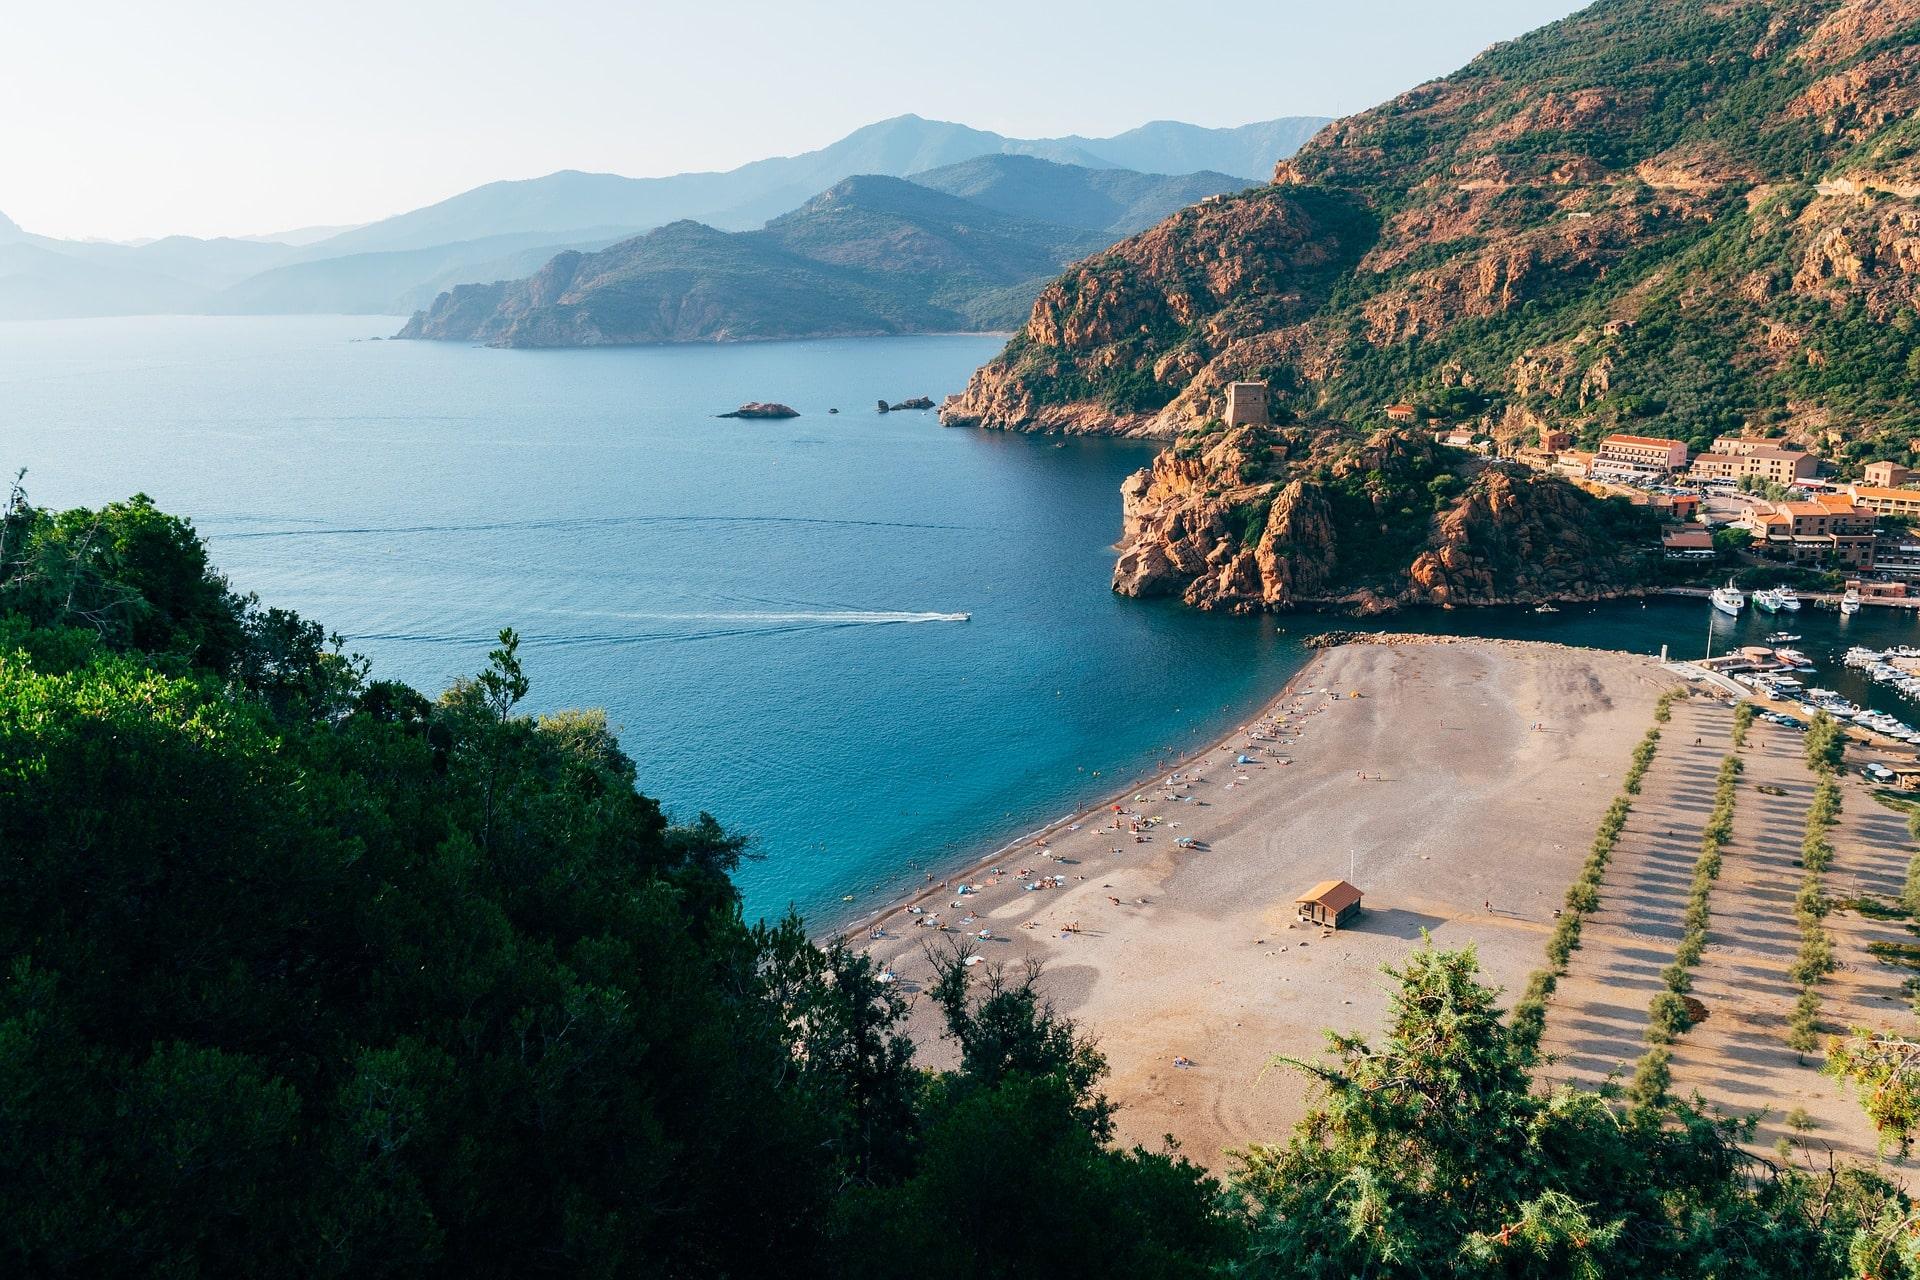 2020 Ajaccio Corsica Cruise Schedule